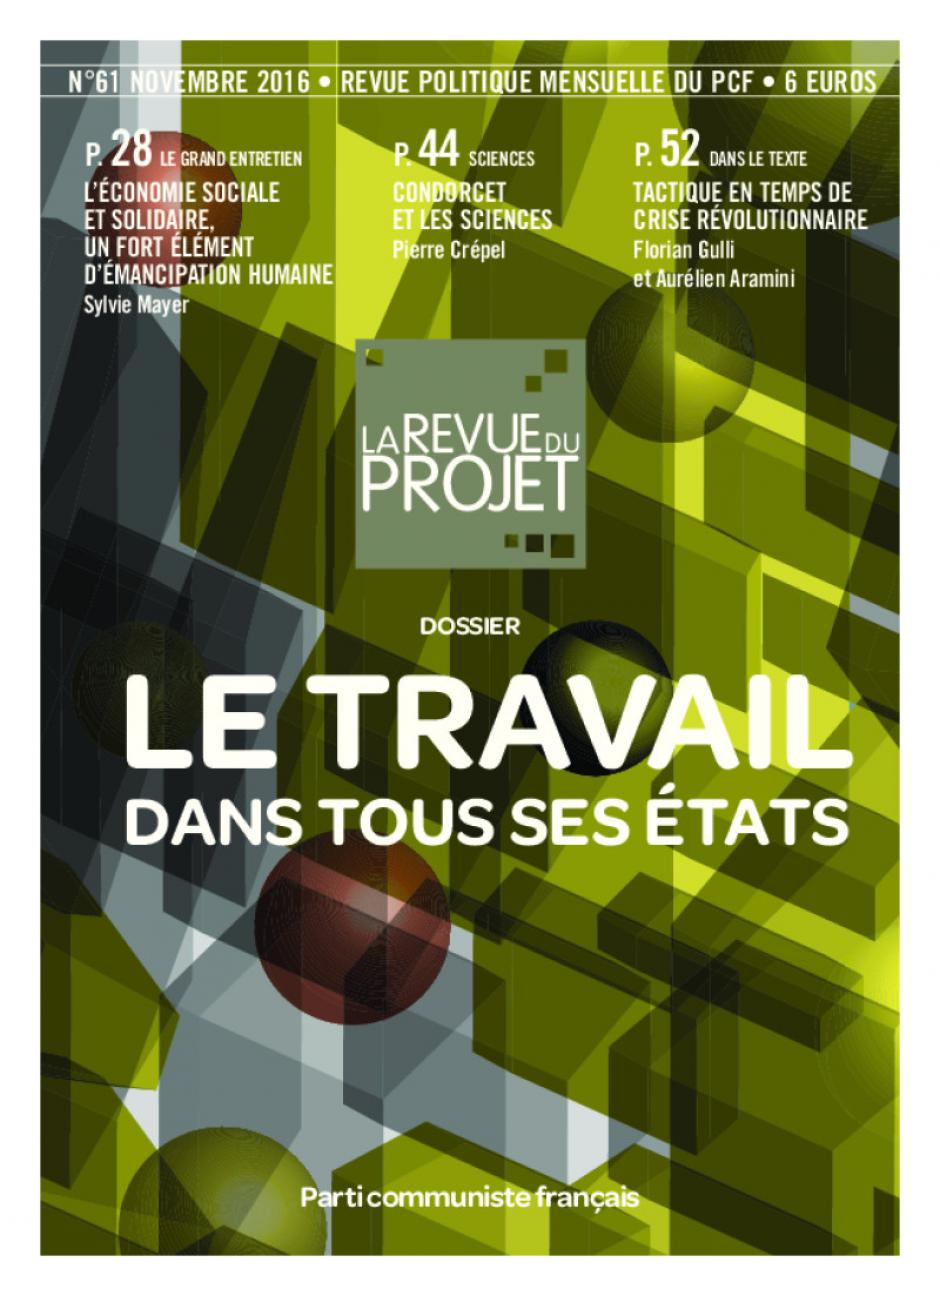 La Revue du projet, n° 61, novembre 2016